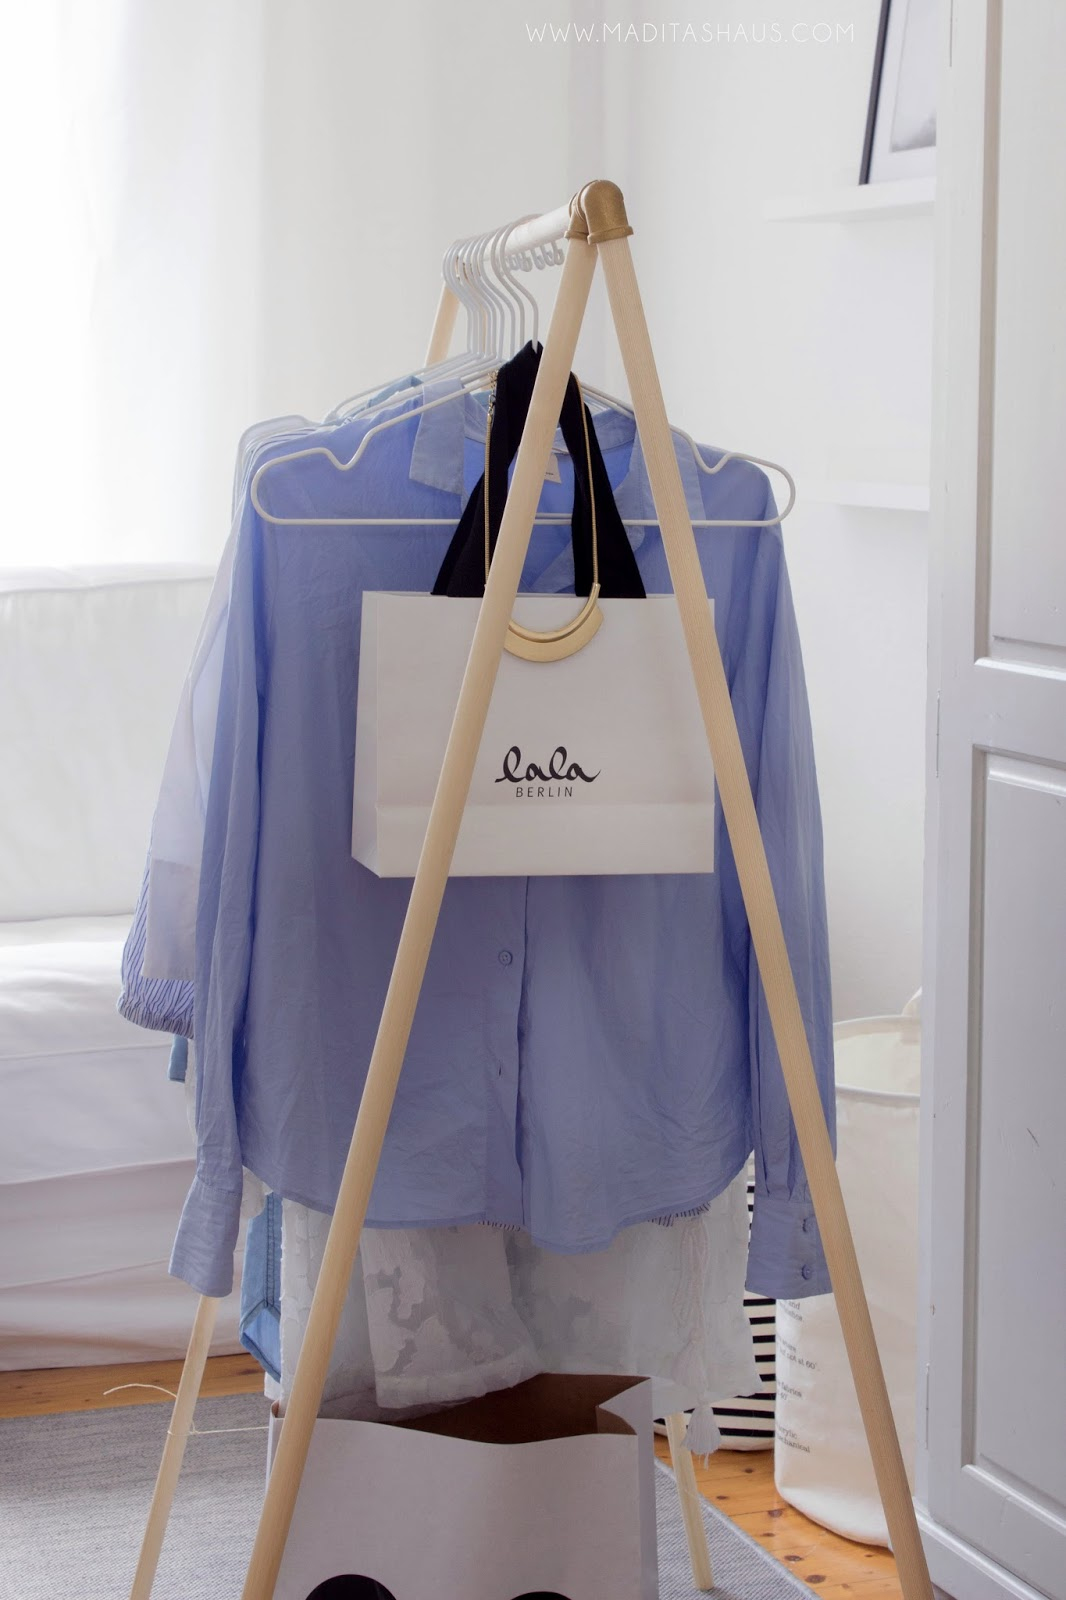 Garderobenstander Selber Bauen Kleiderstander Holz Jamgo Co